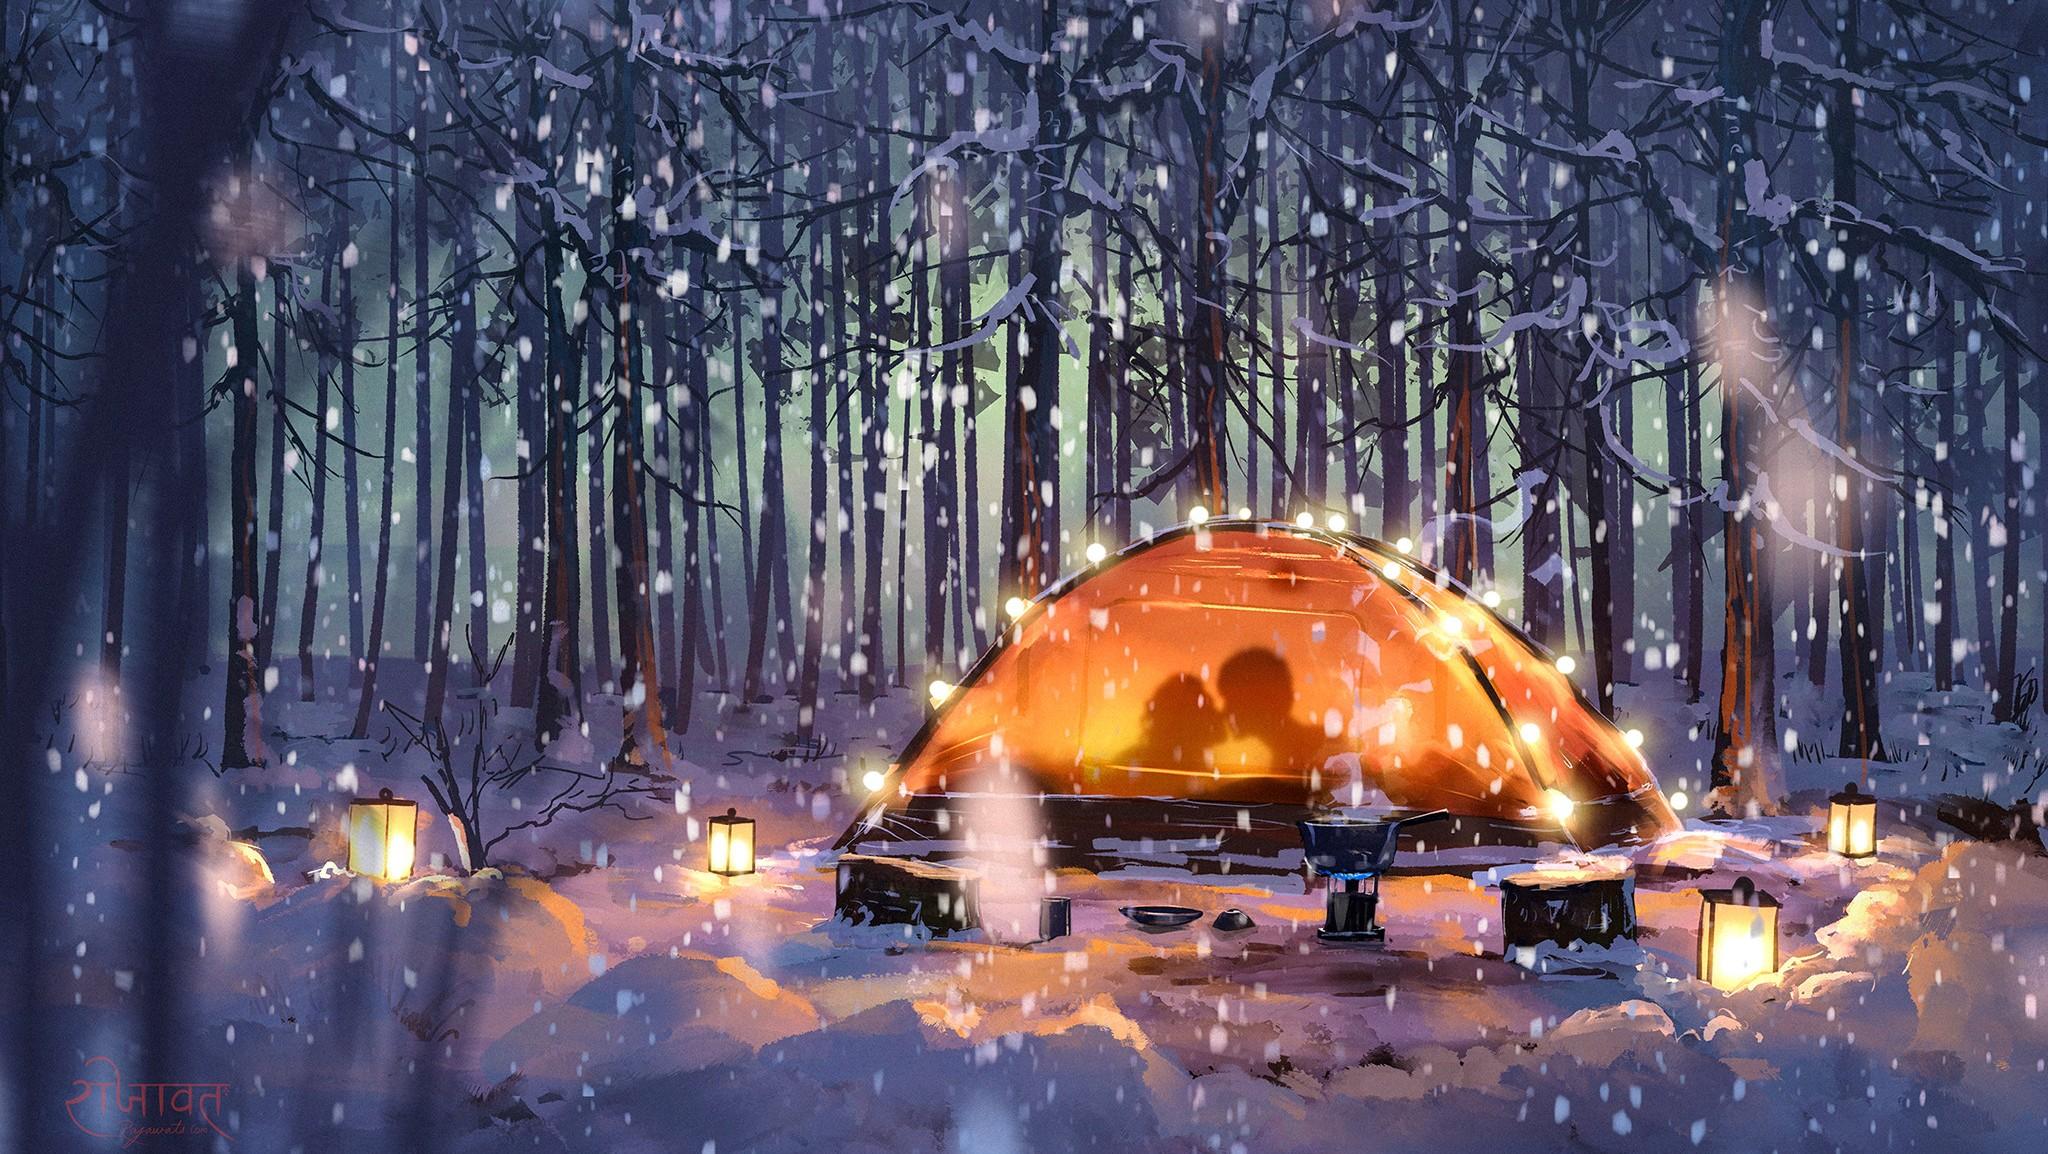 Anime 2048x1154 couple night forest snow lantern anime winter Surendra Rajawat